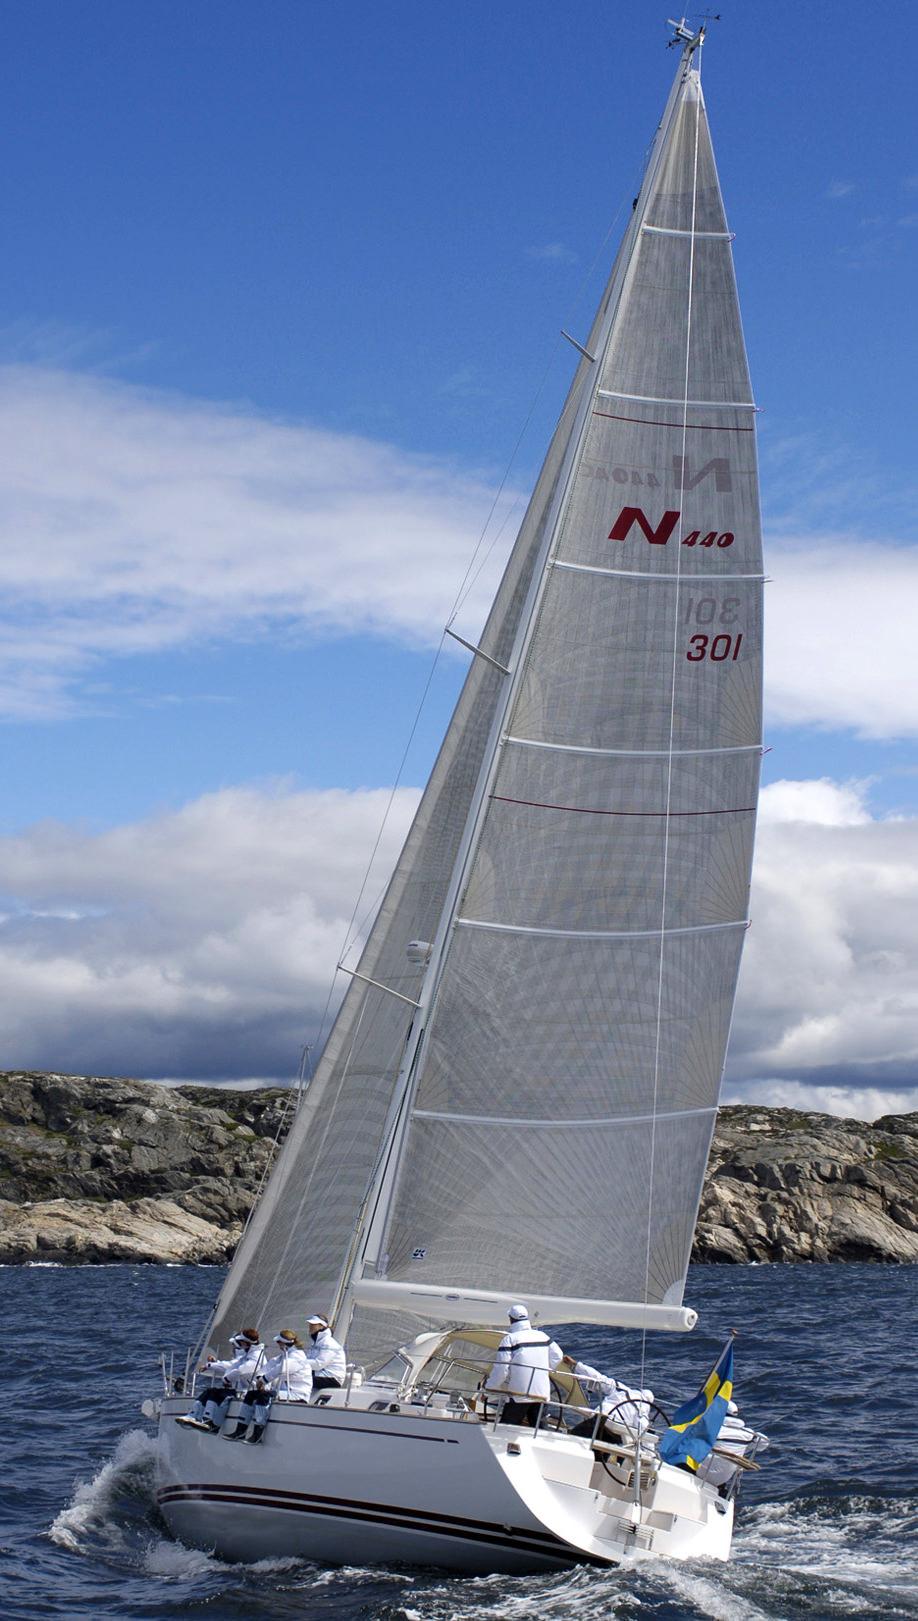 Titanium Double Taffeta fully battened mainsail.